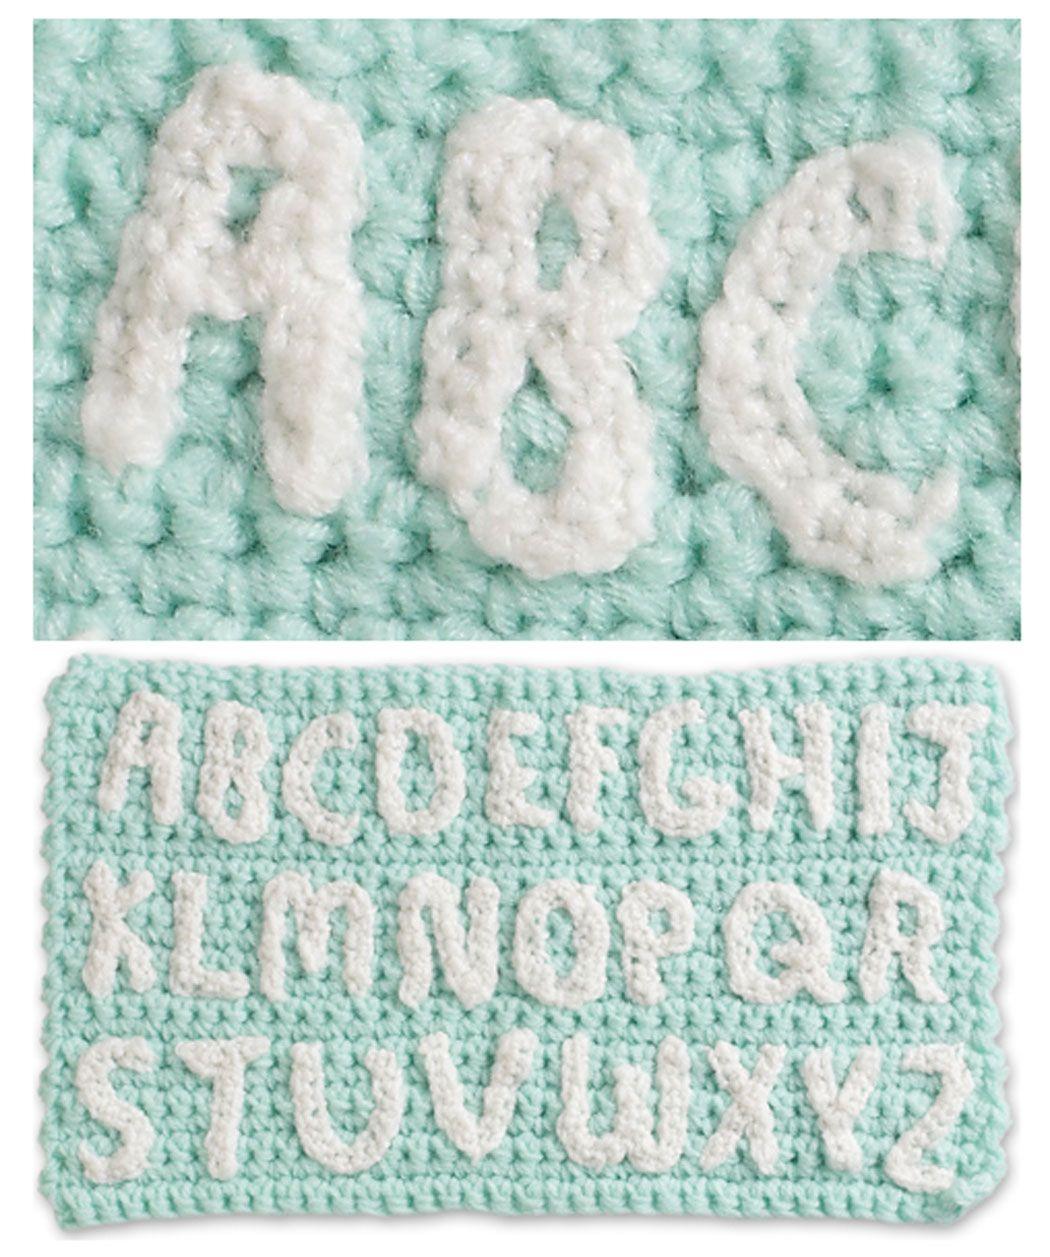 A To Z In Crochet Royalbaby Alphabet Crochet Redheartyarns